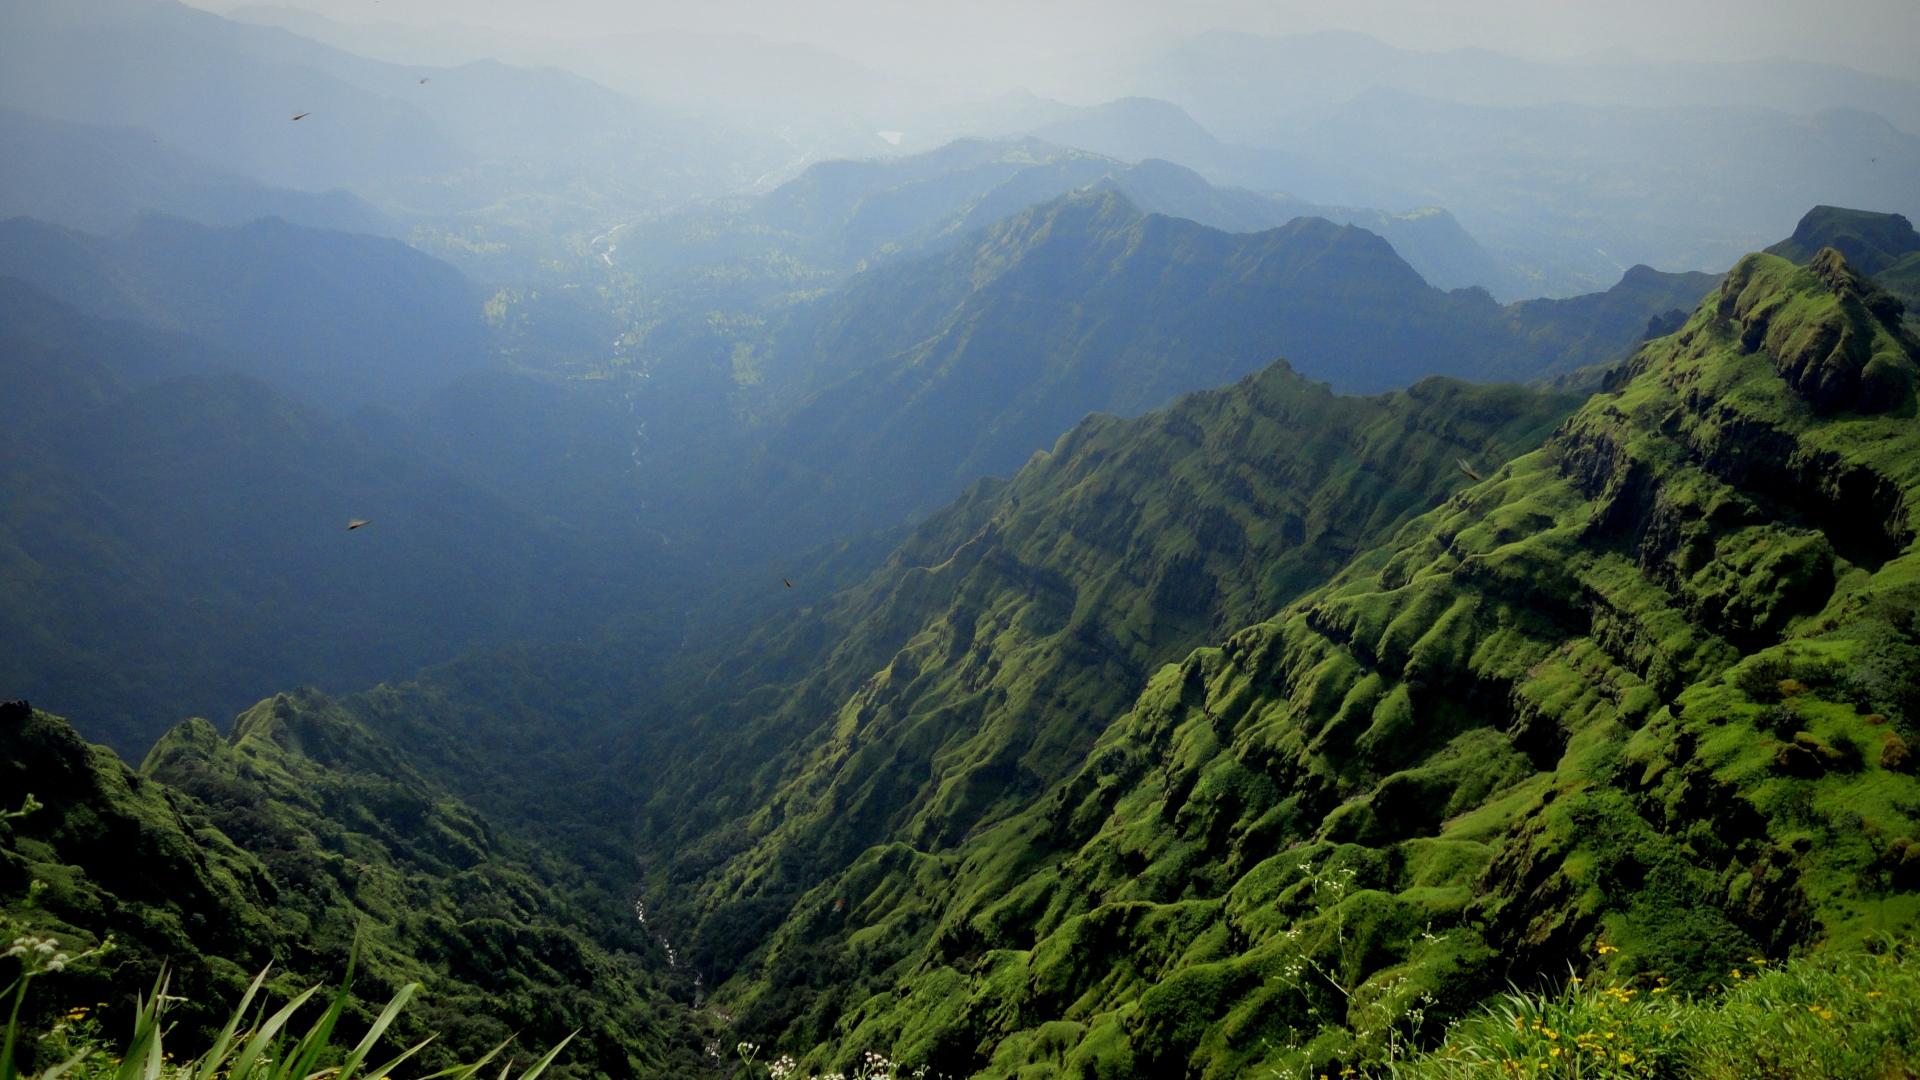 Must see Wallpaper Mountain Fog - mountains_fog_landscape_84625_1920x1080  Photograph_481488.jpg